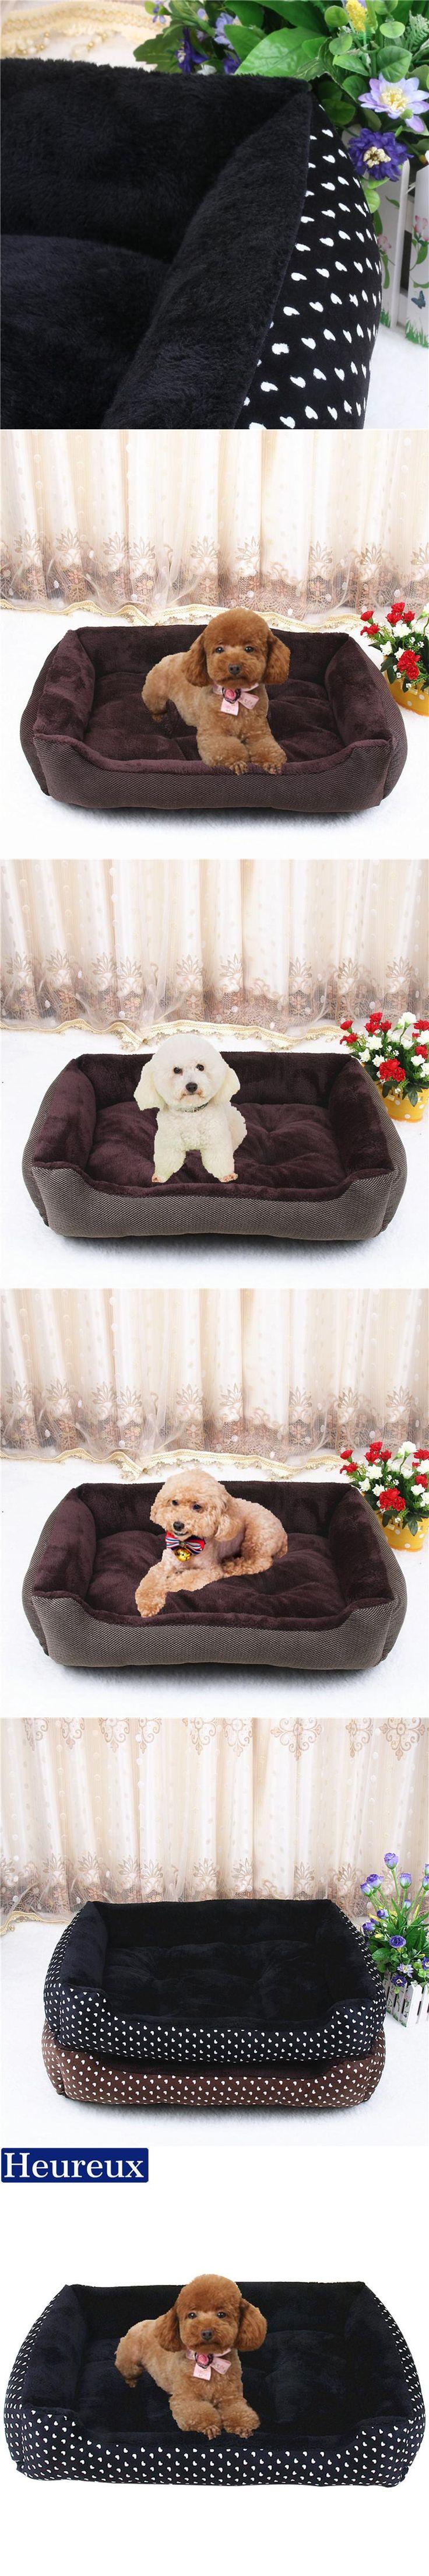 Best dog beds ideas on Pinterest